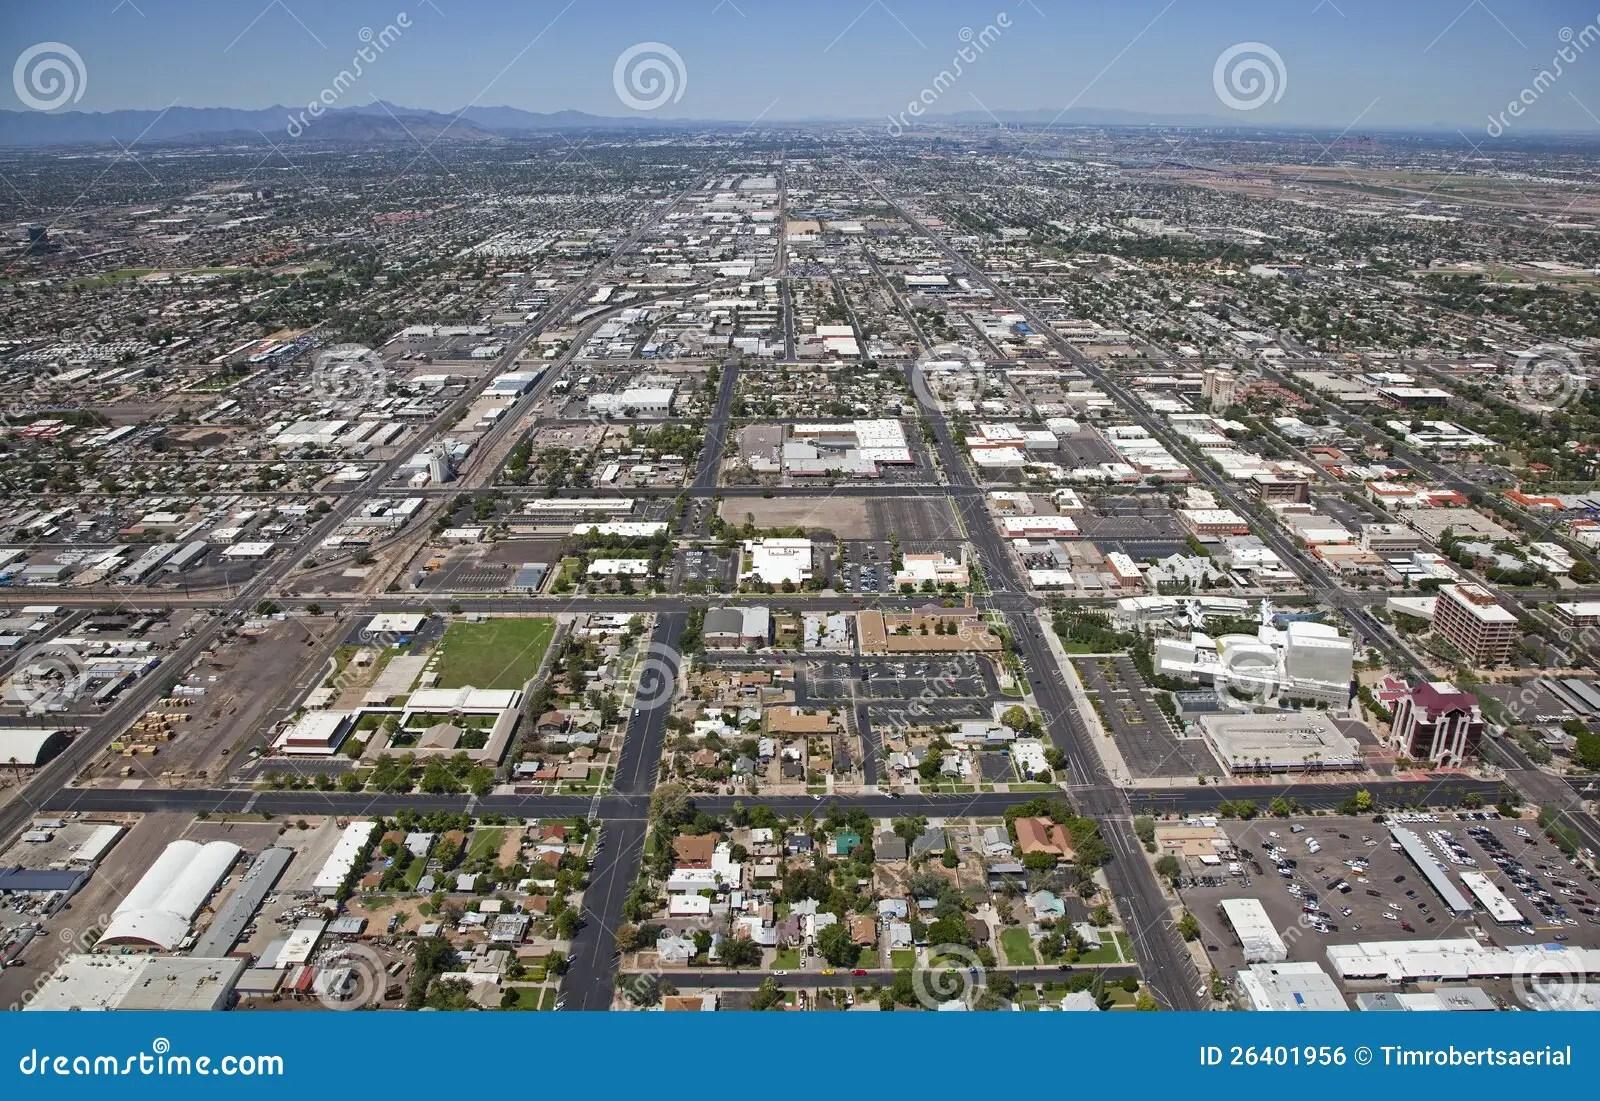 Mesa Arizona Skyline Royalty Free Stock Image  Image 26401956